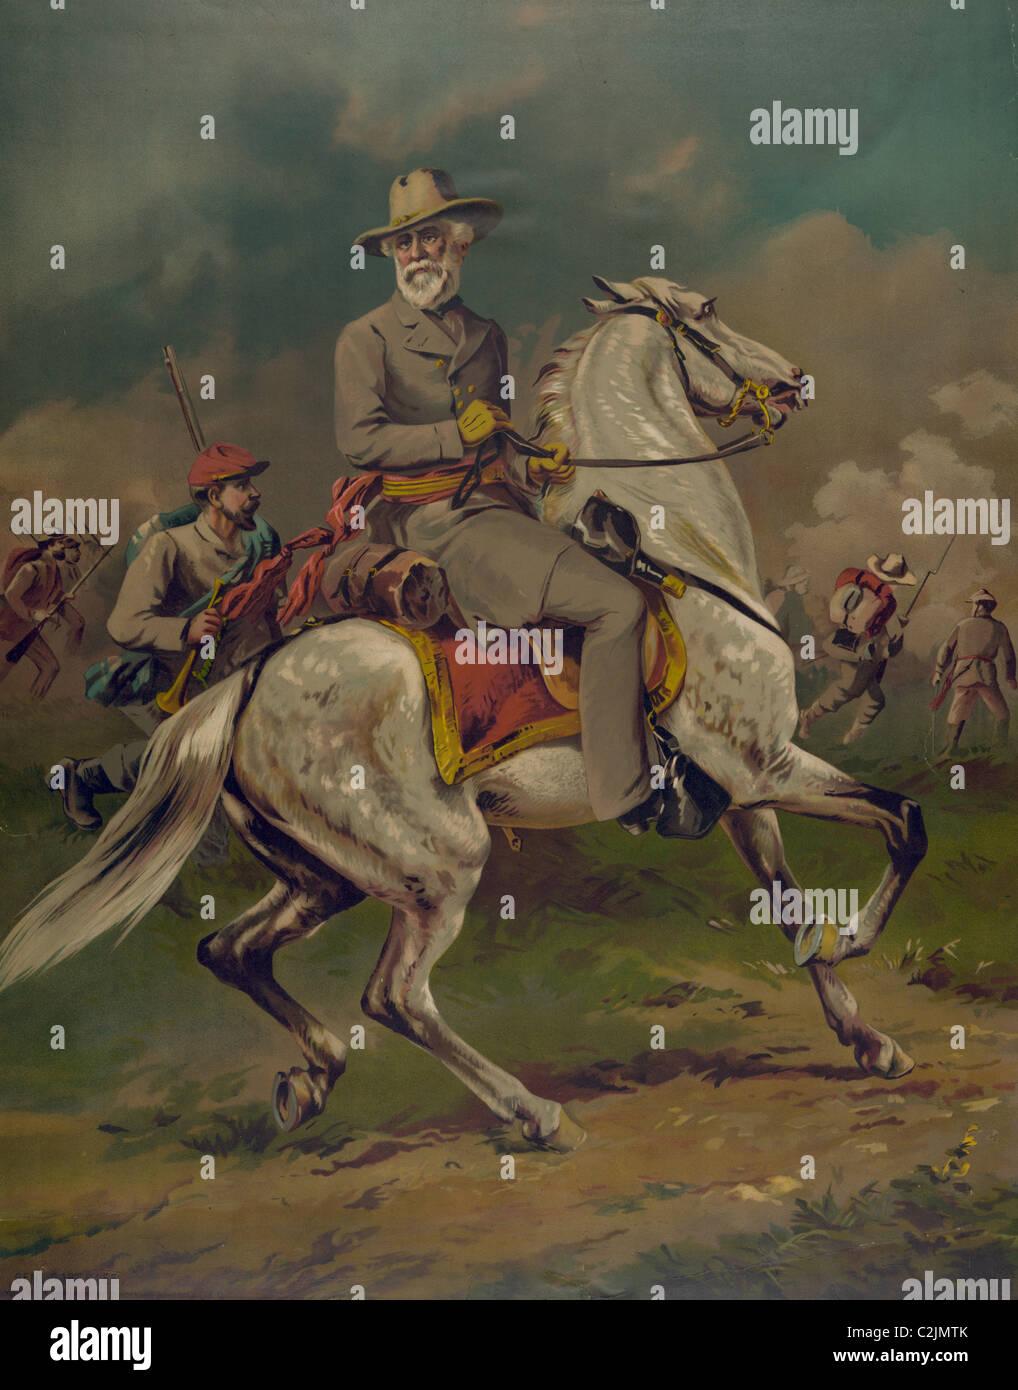 General Robert E. Lee on his horse Traveler - Stock Image